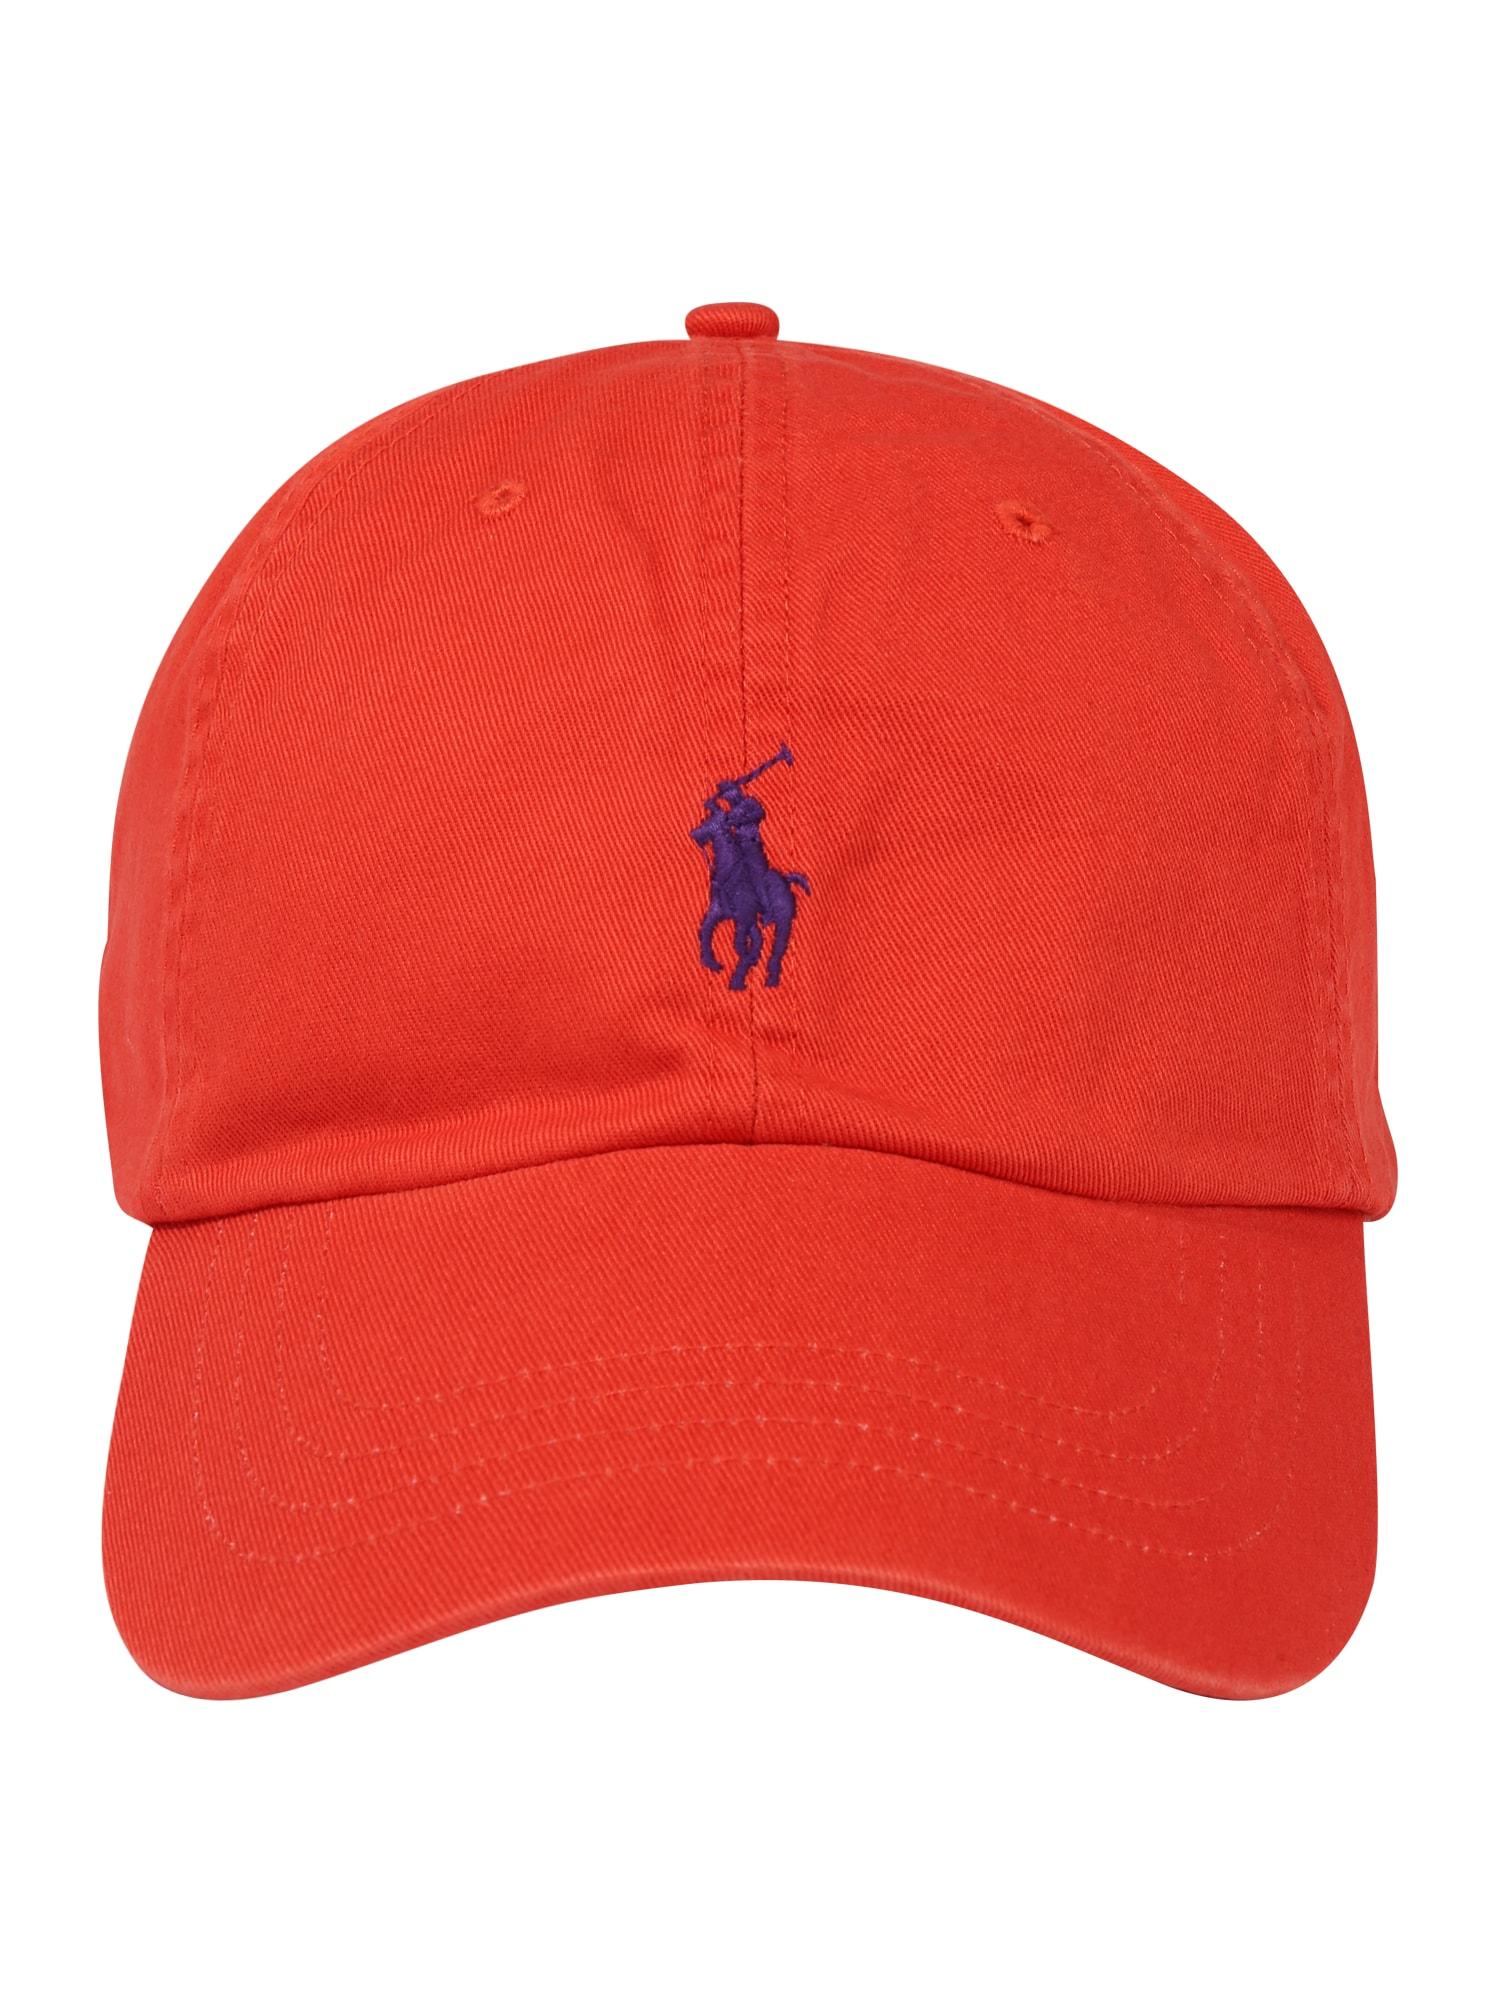 POLO RALPH LAUREN Športová šiltovka  oranžovo červená